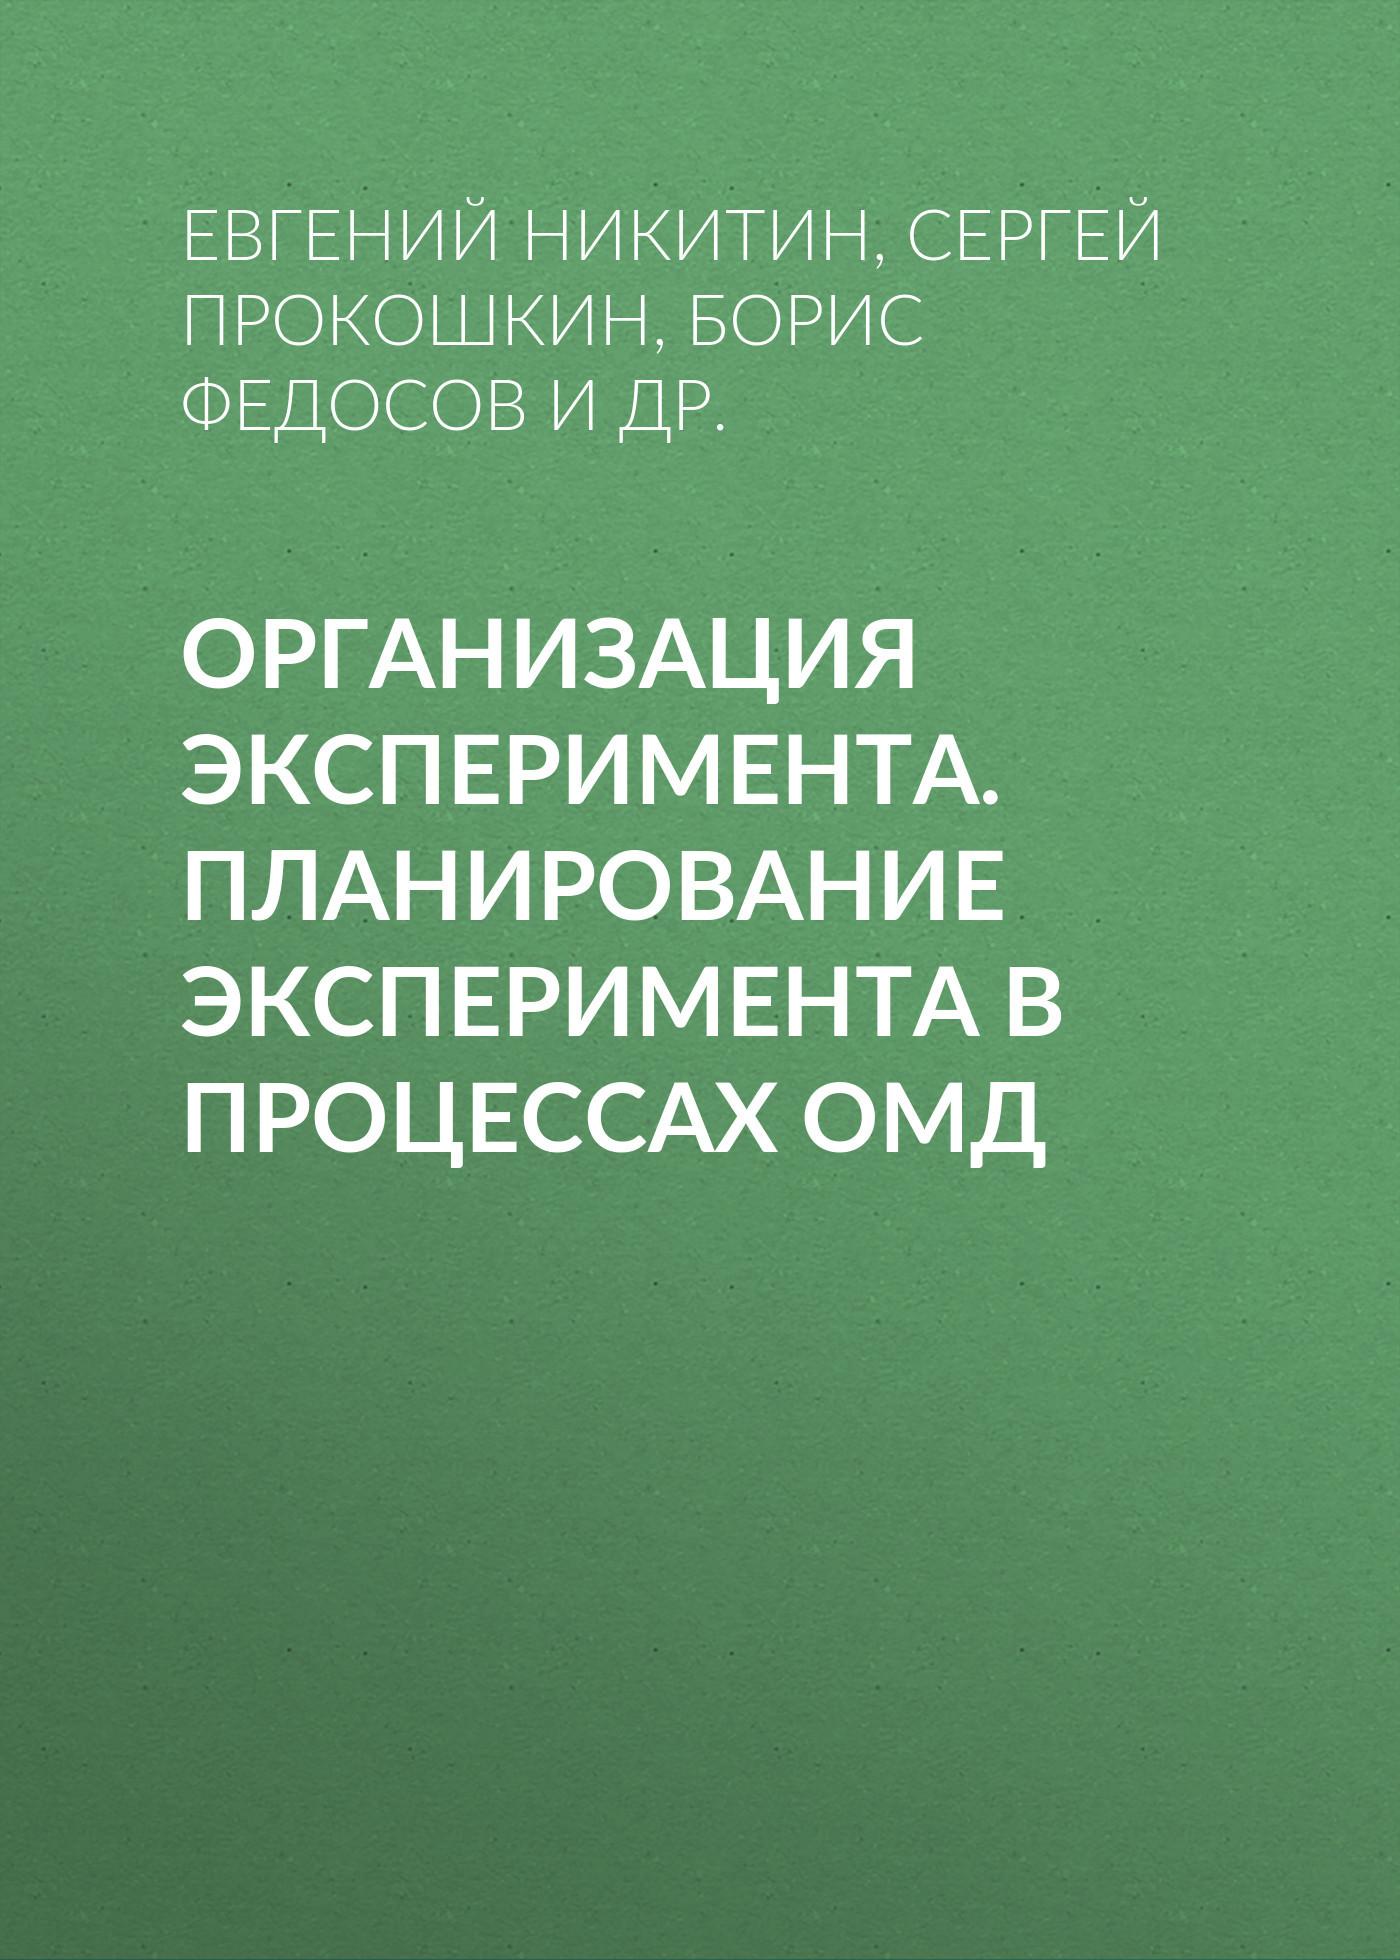 Евгений Никитин бесплатно